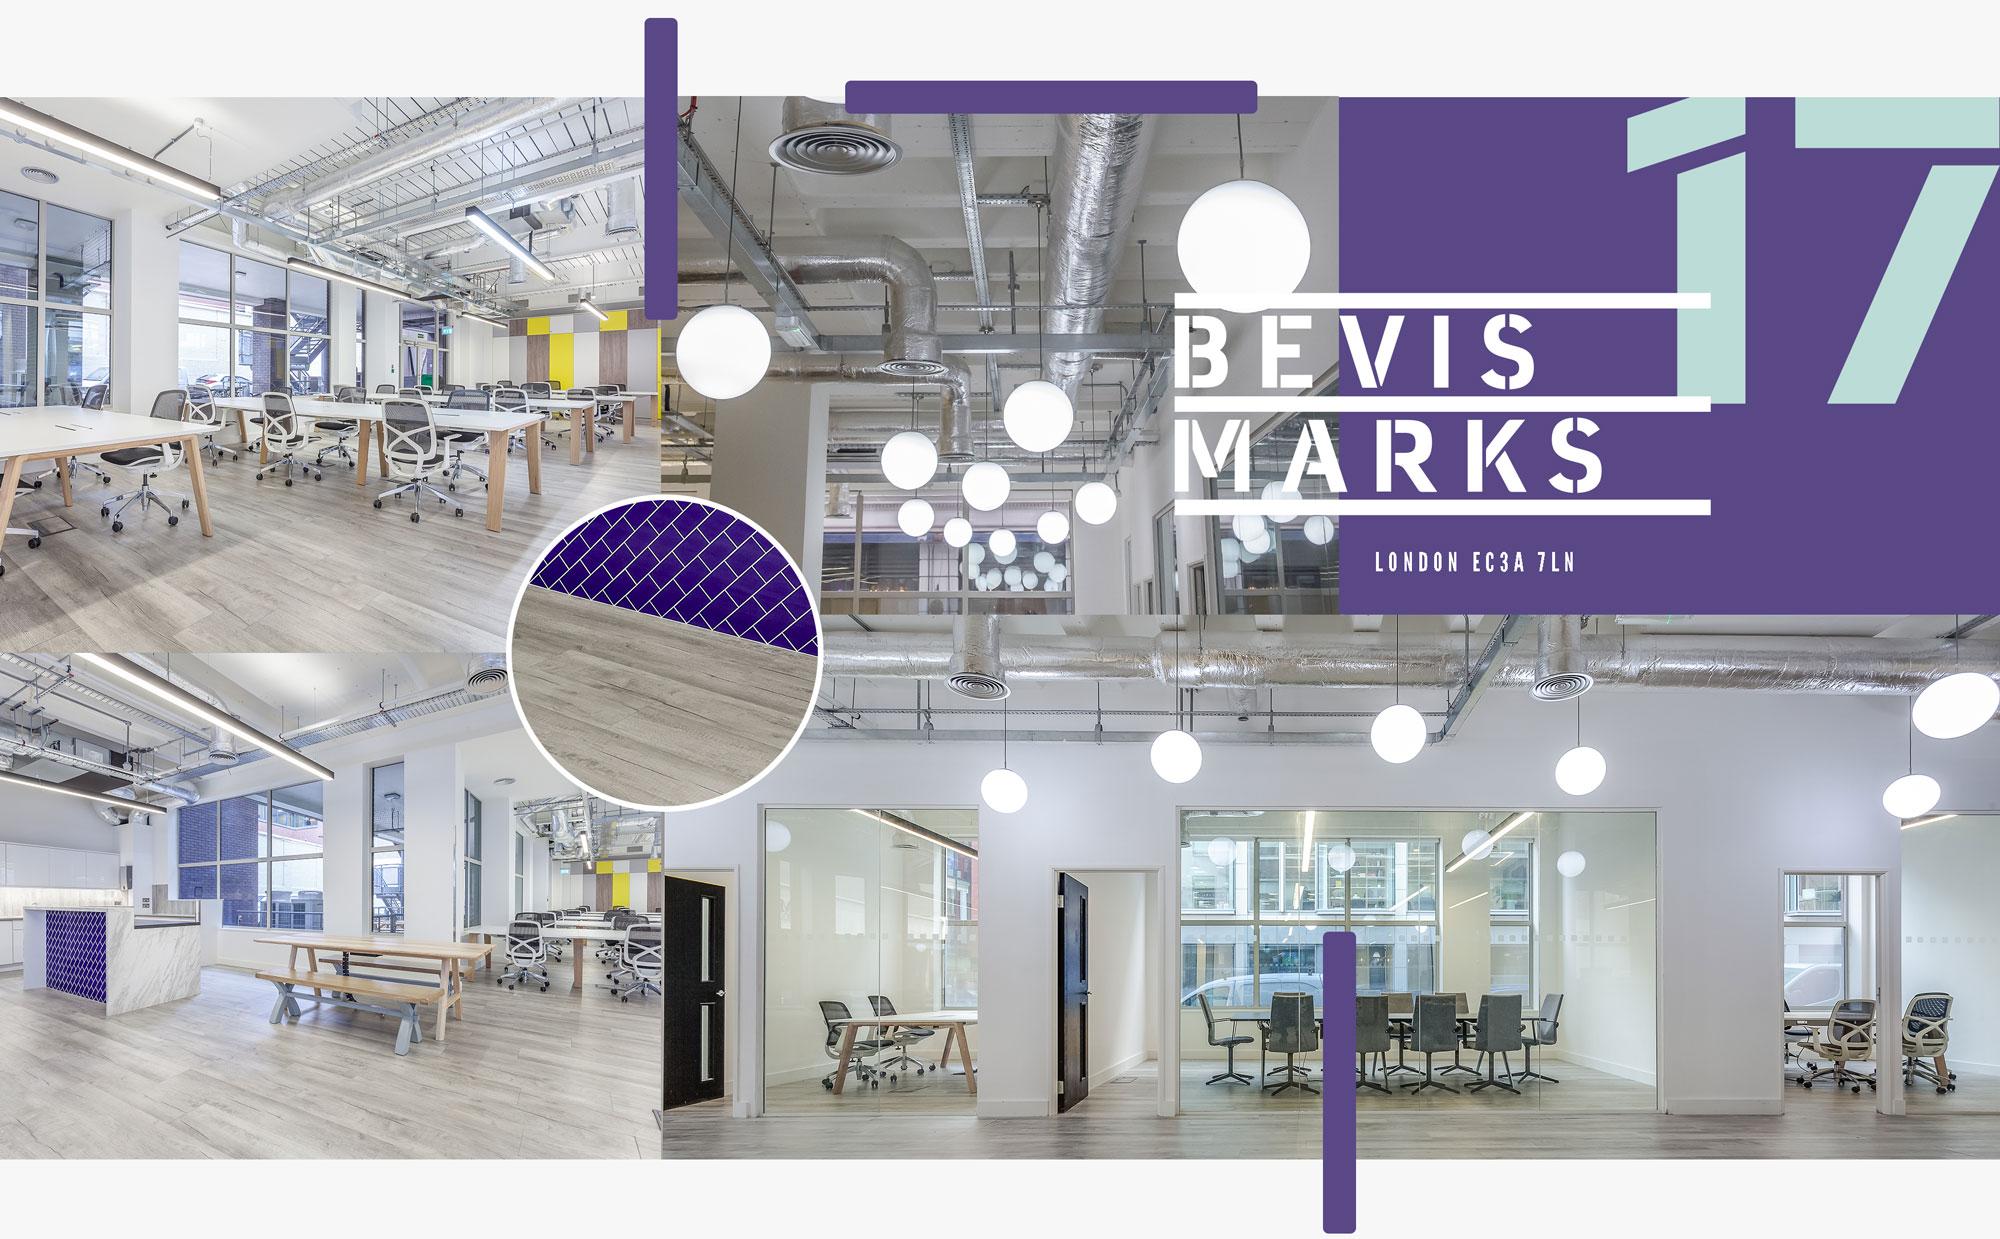 Overview_block_Bevis-Marks.jpg